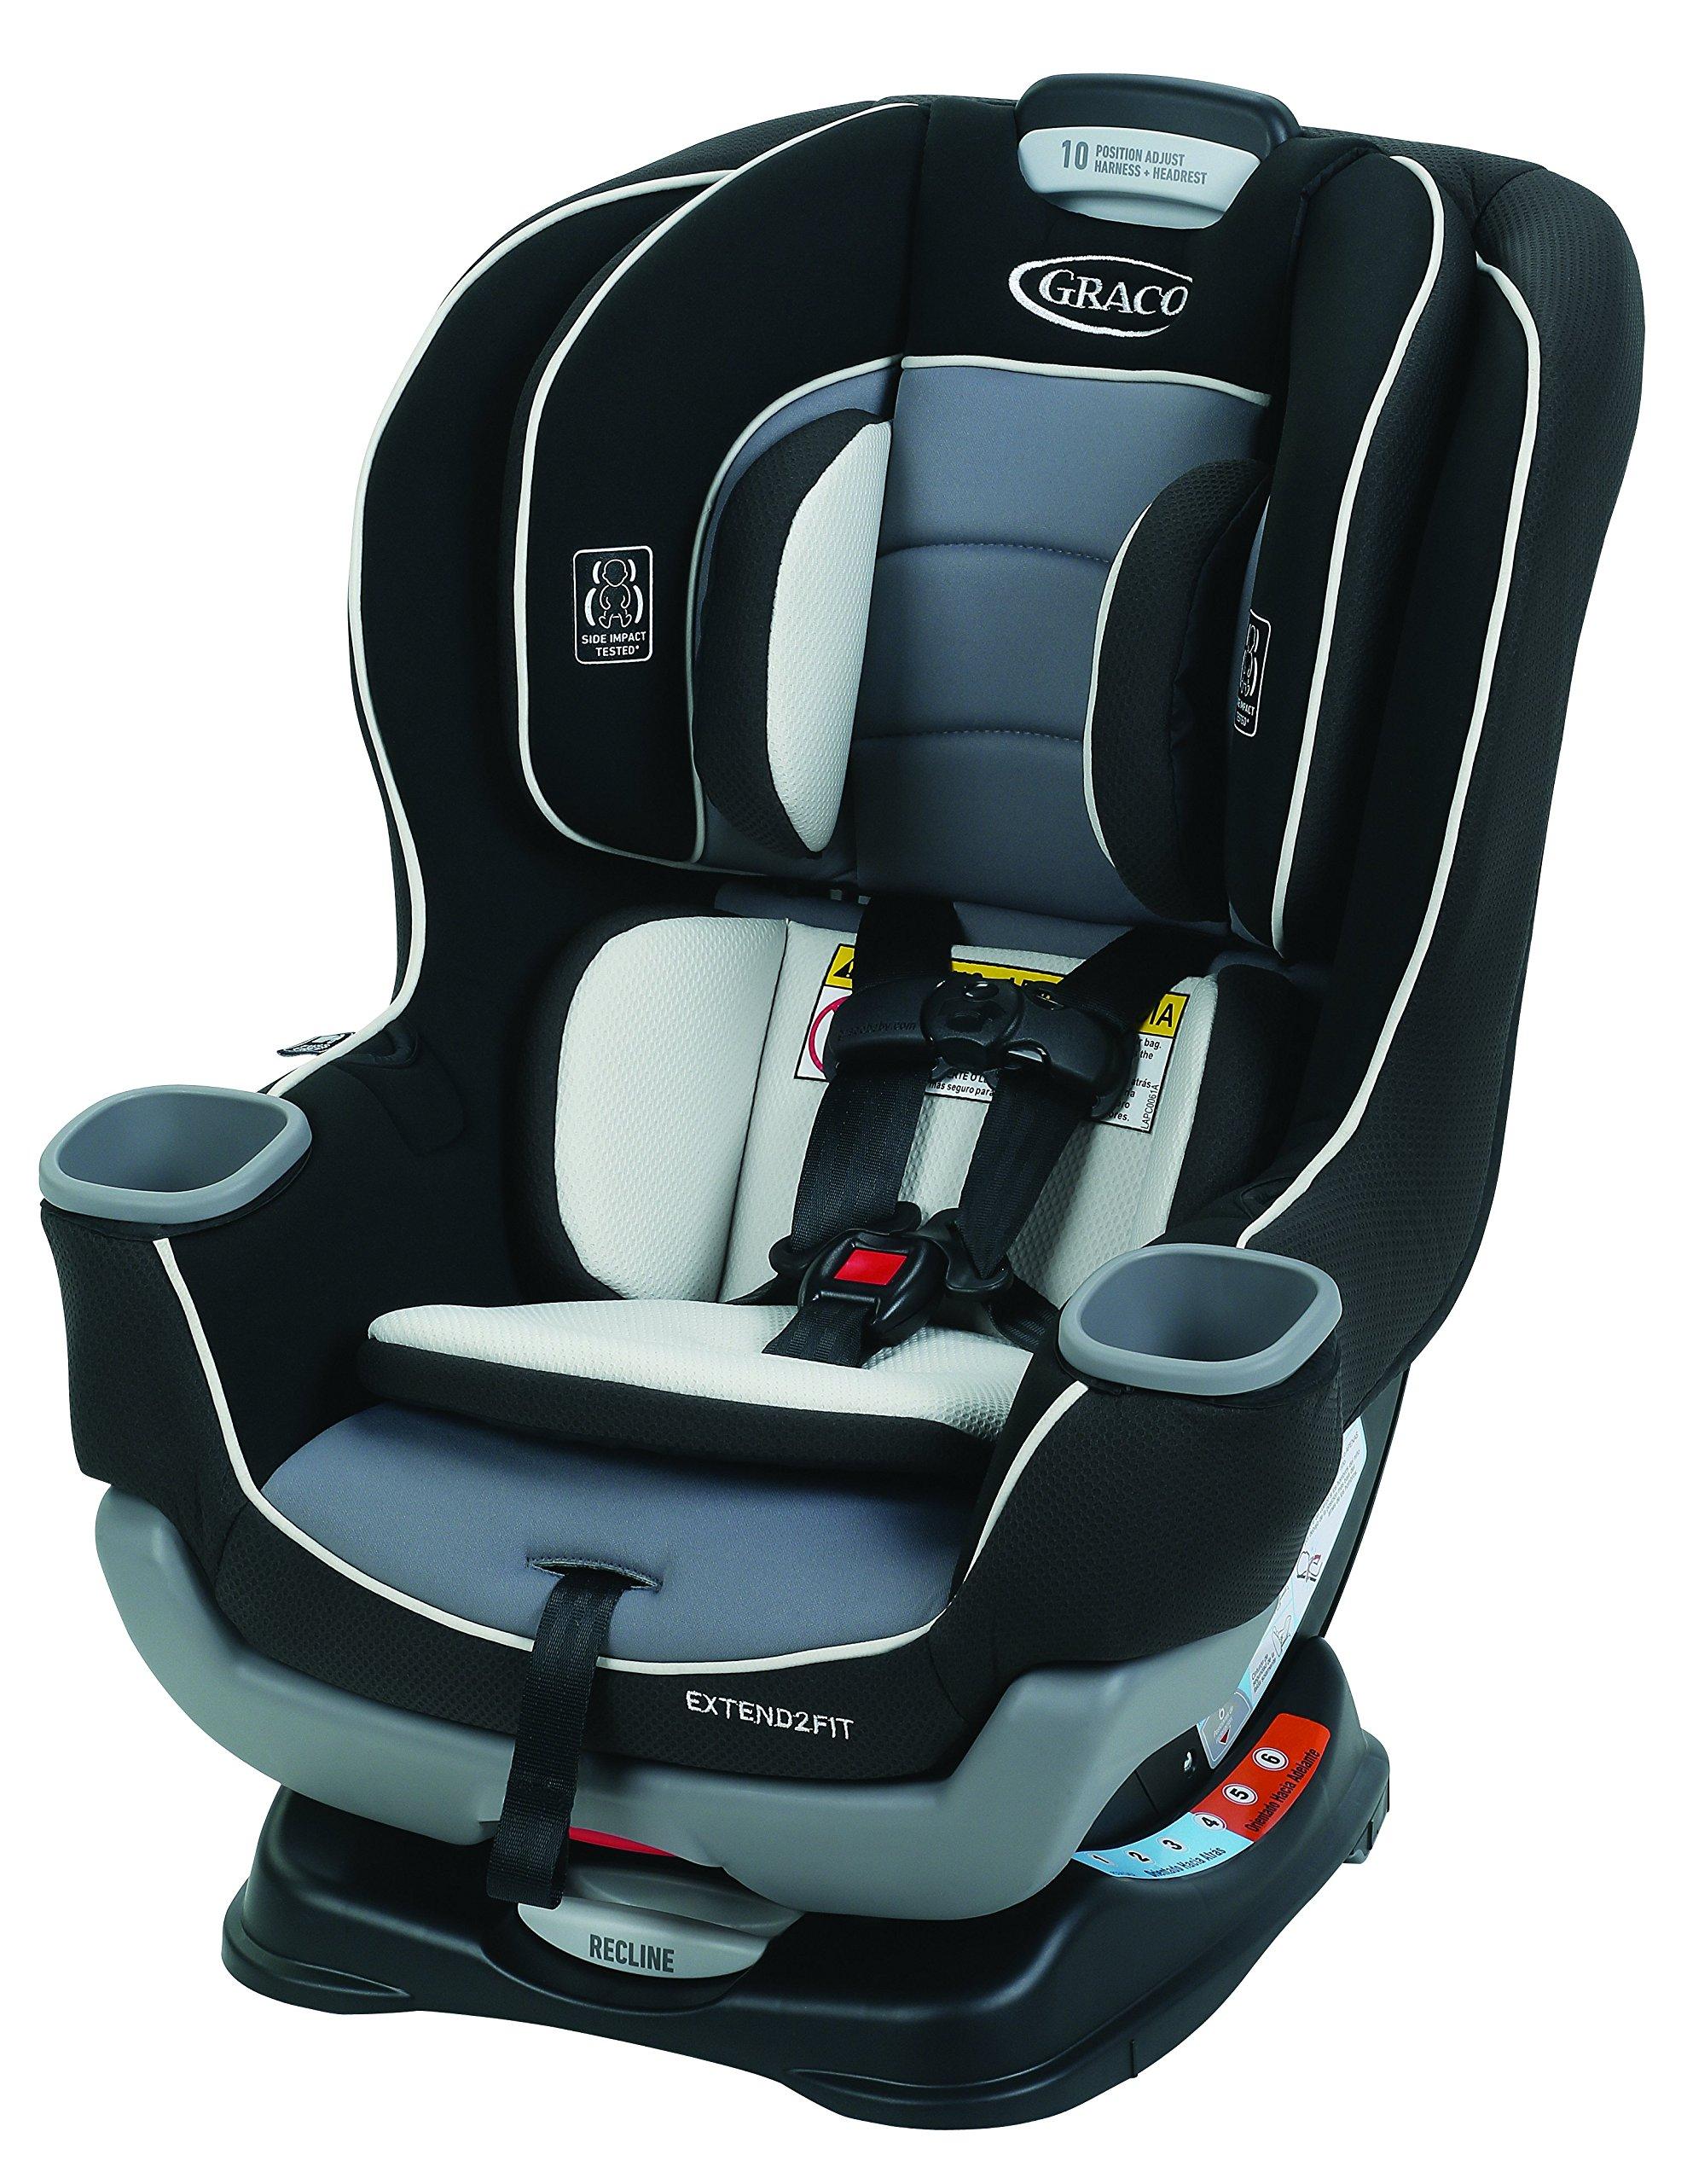 Graco Extend2Fit Convertible Car Seat Gotham  sc 1 st  Amazon.com & Amazon.com : Graco Atlas 65 2-in-1 Harness Booster Car Seat Nyssa ... islam-shia.org